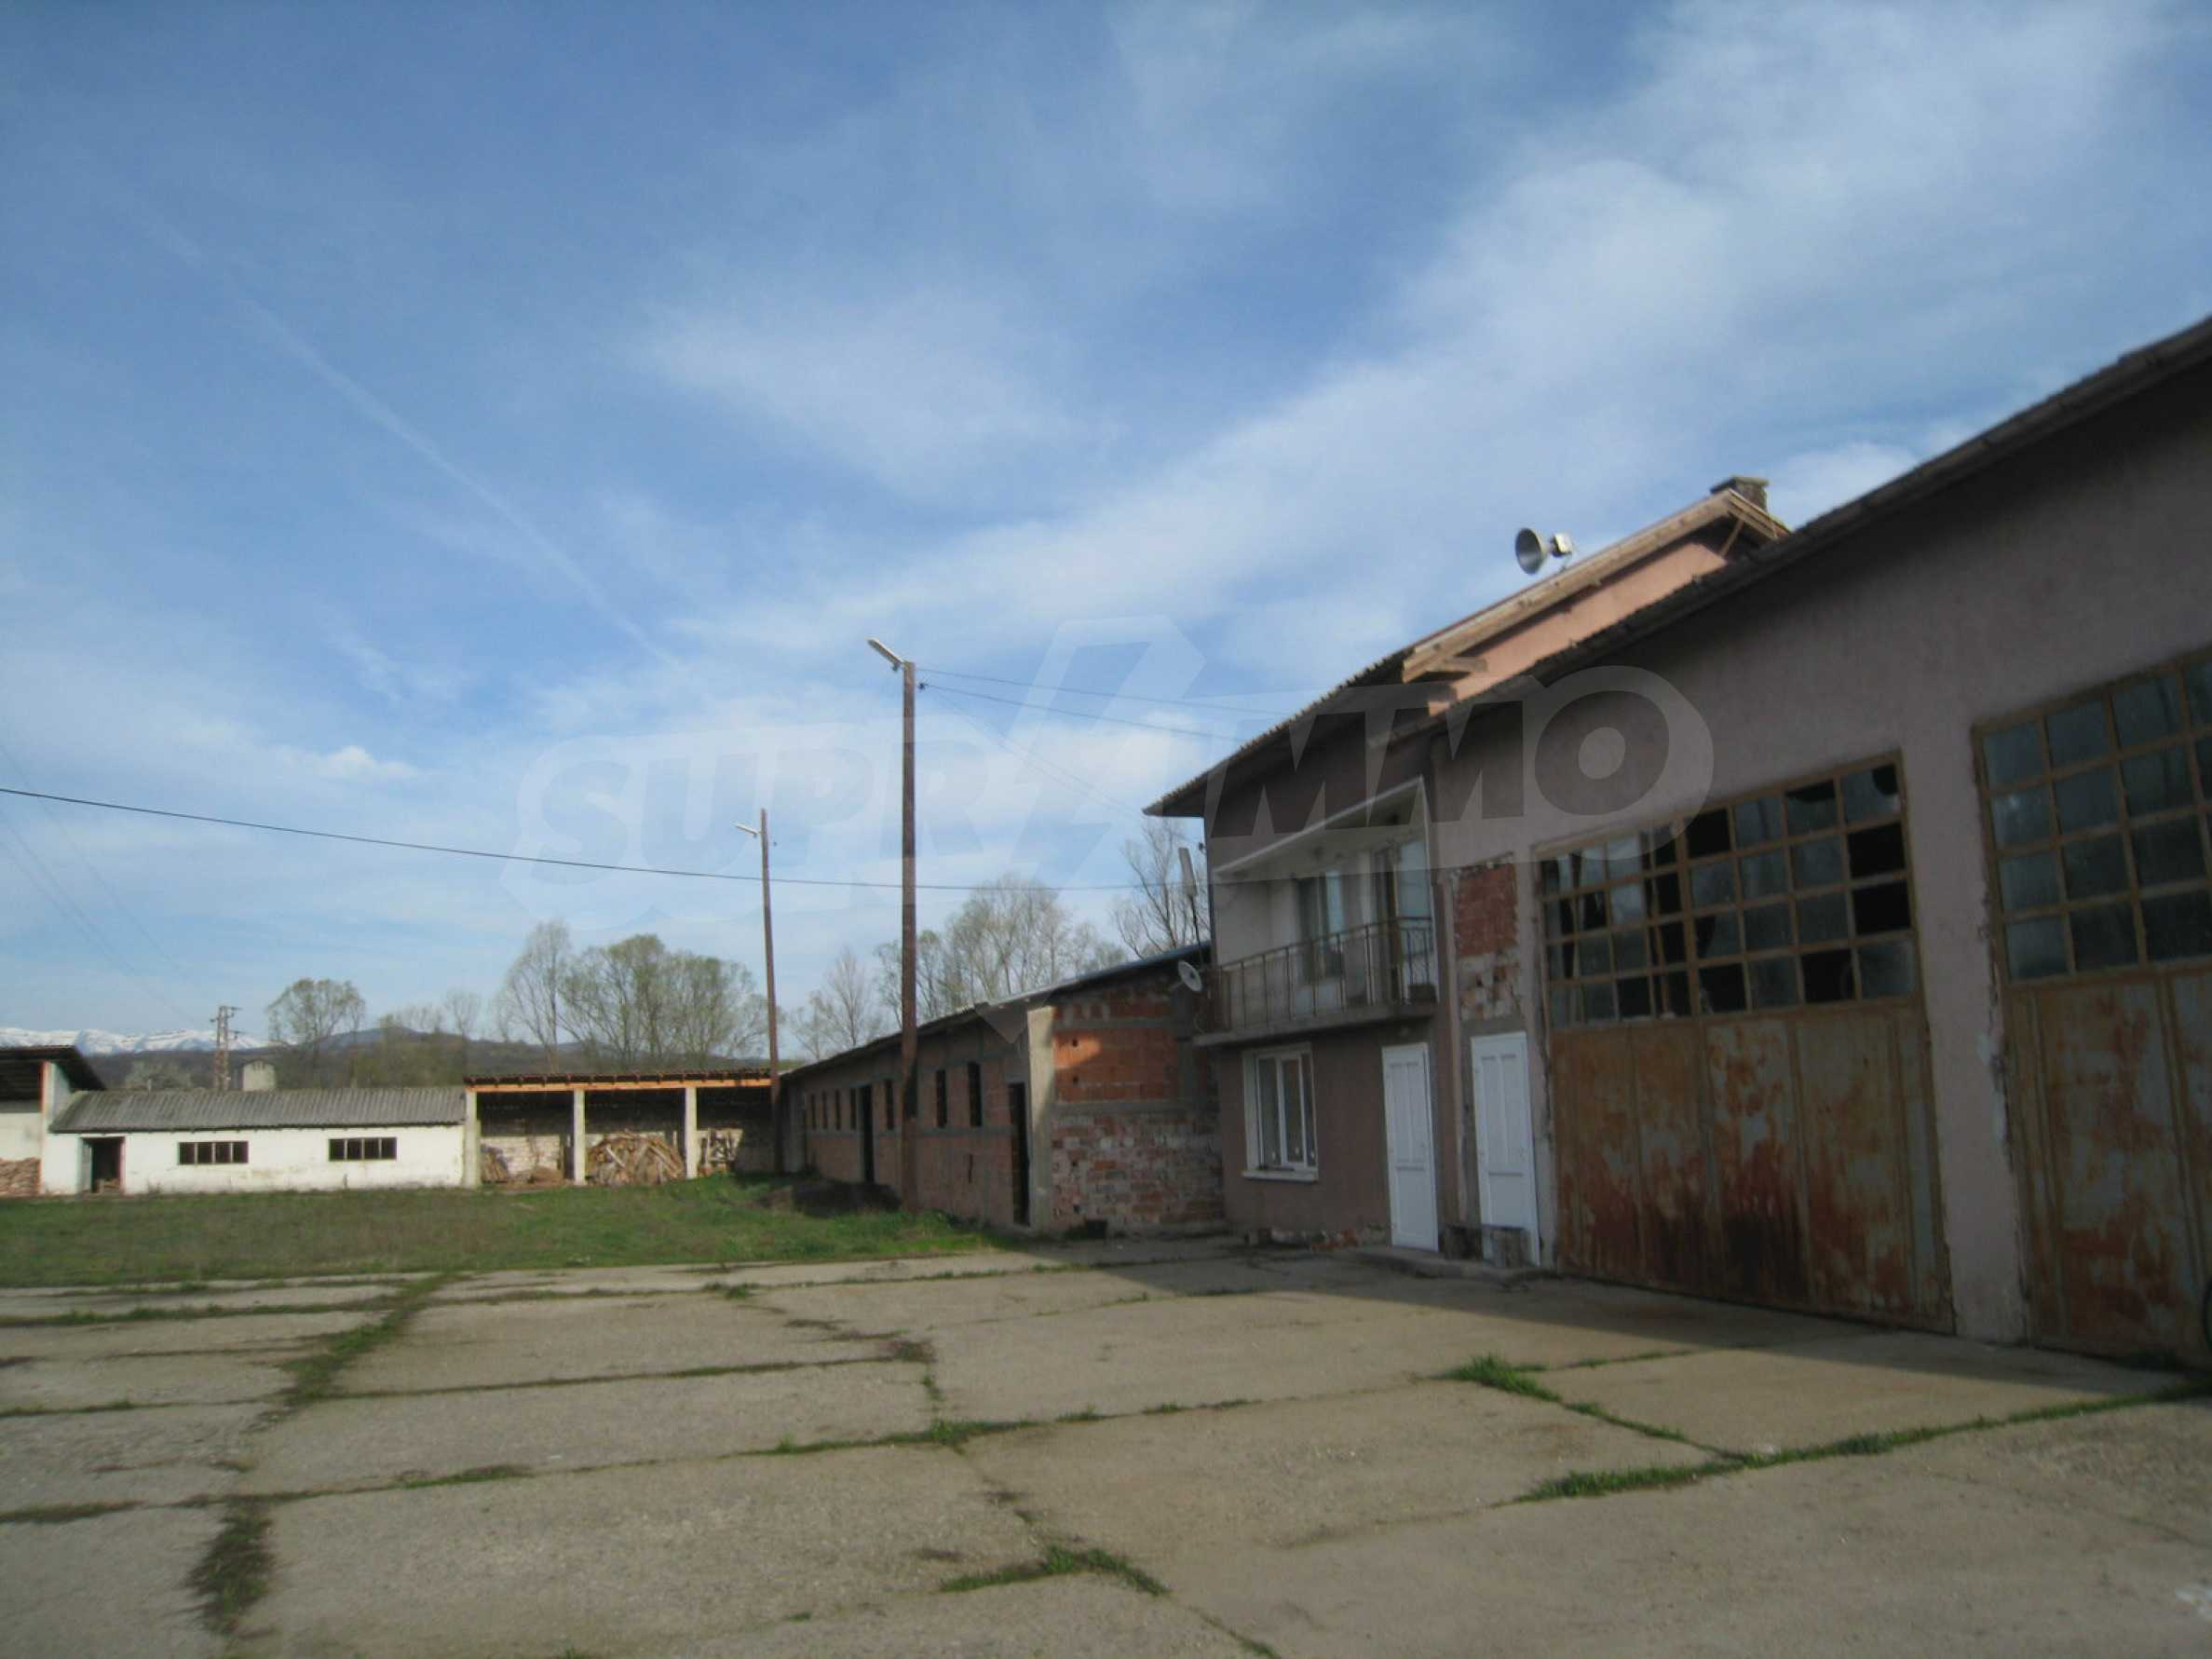 Fishpond, warehouses, residential areas and asphalt ground near Montana 2